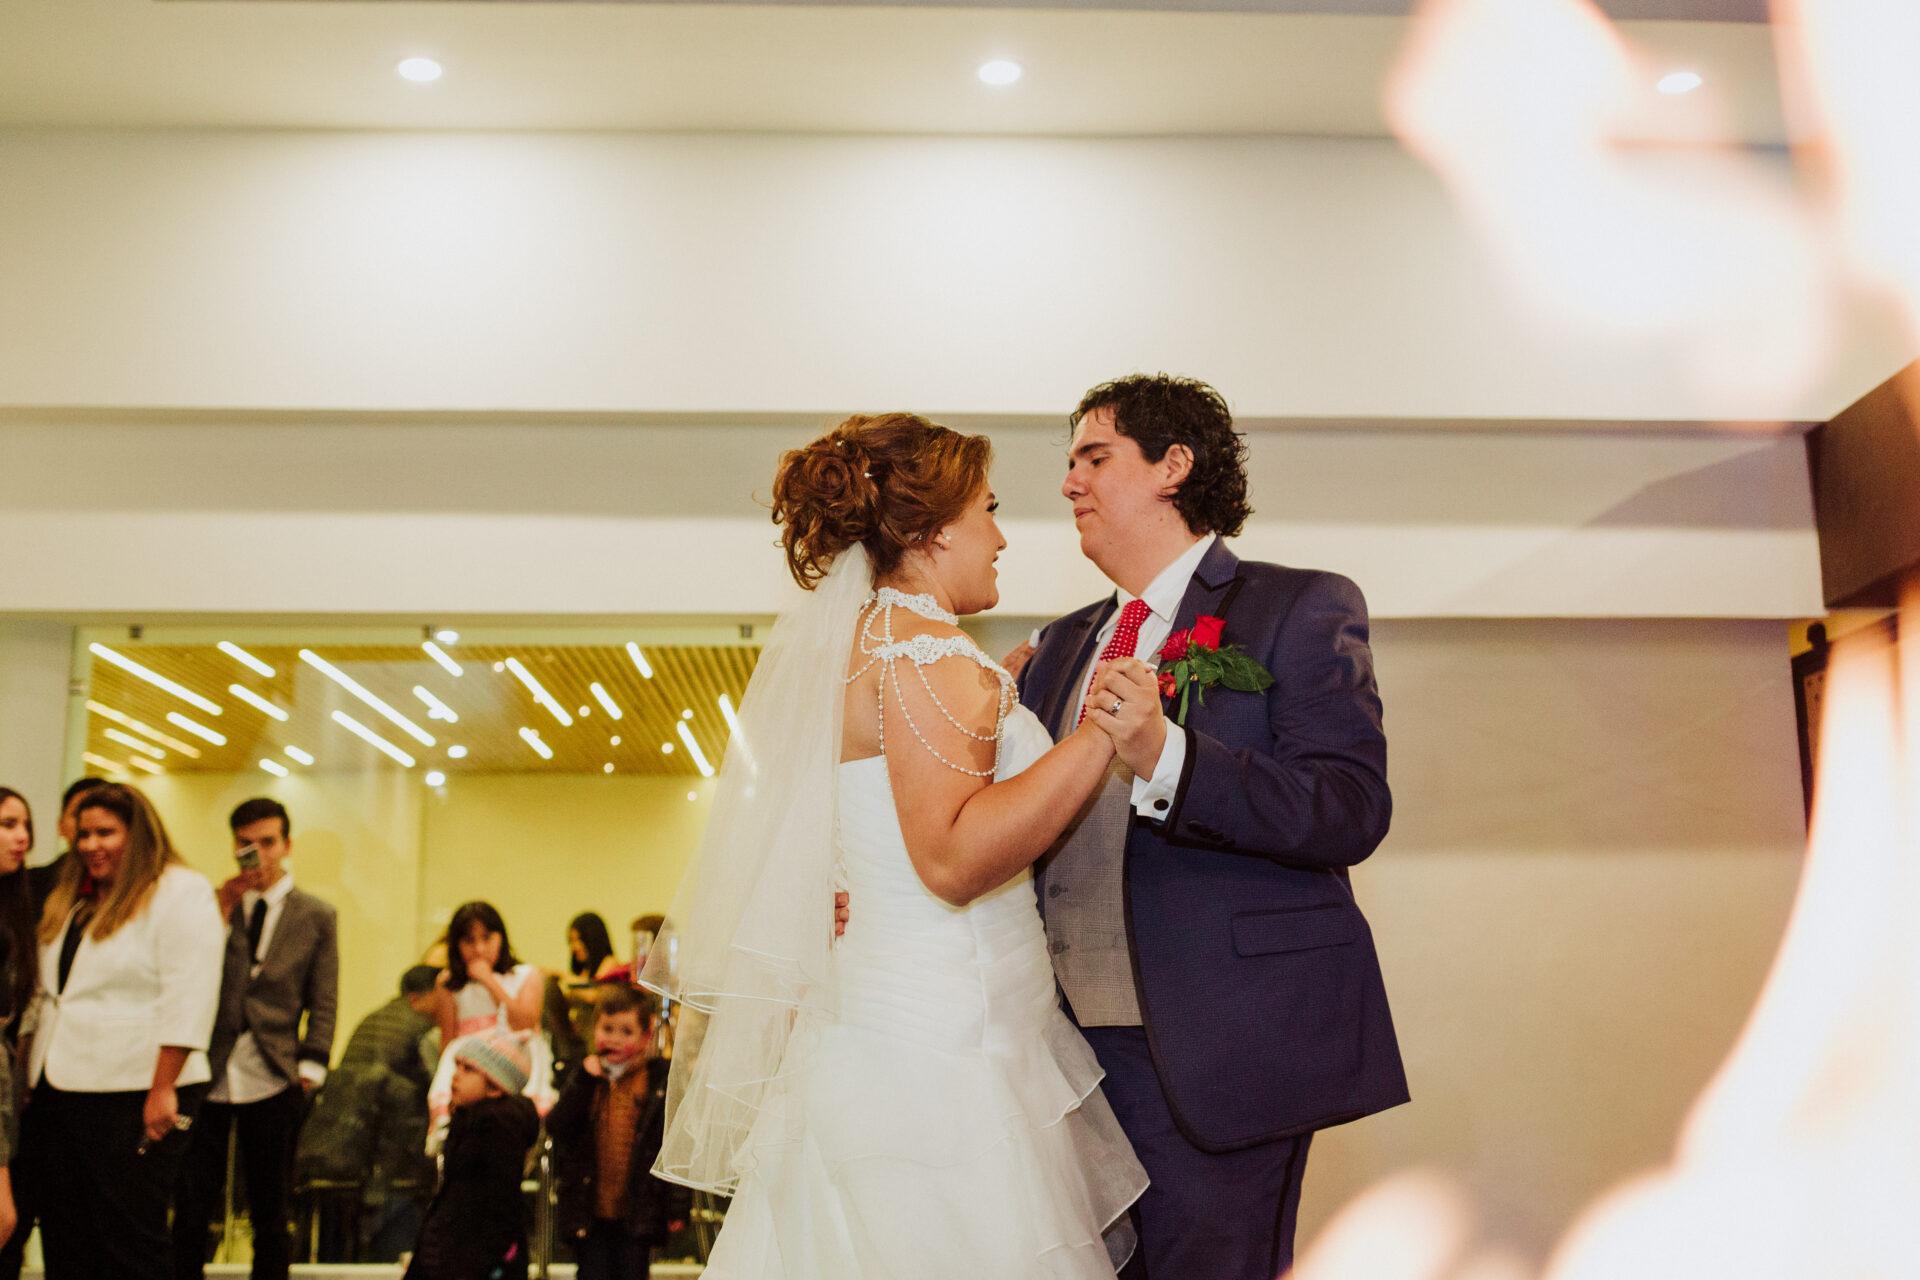 javier_noriega_fotografo_bodas_gaviones_zacatecas_wedding_photographer33